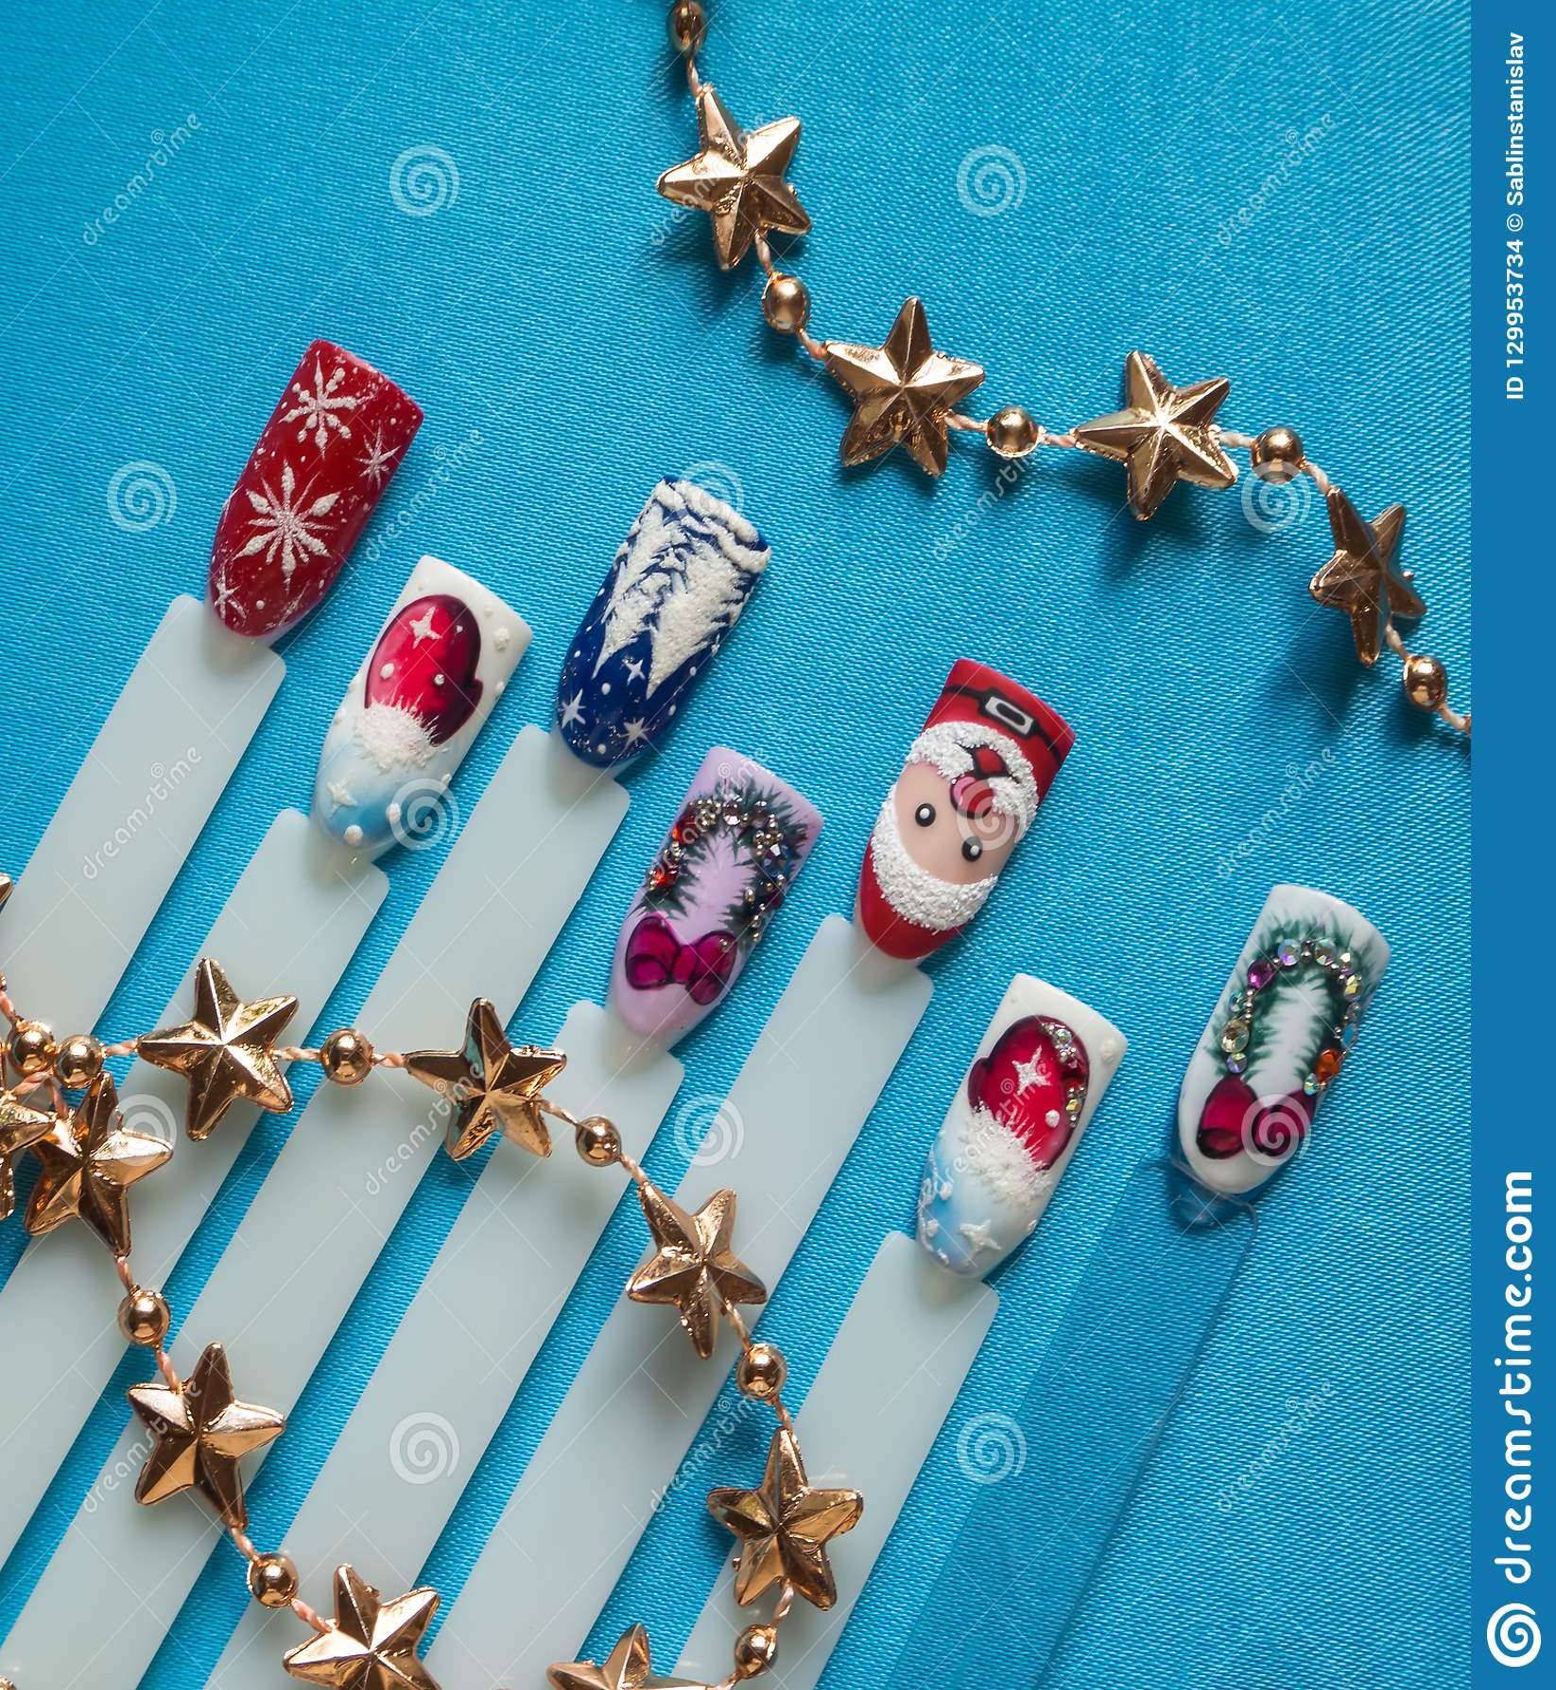 Nail design with festive Christmas theme